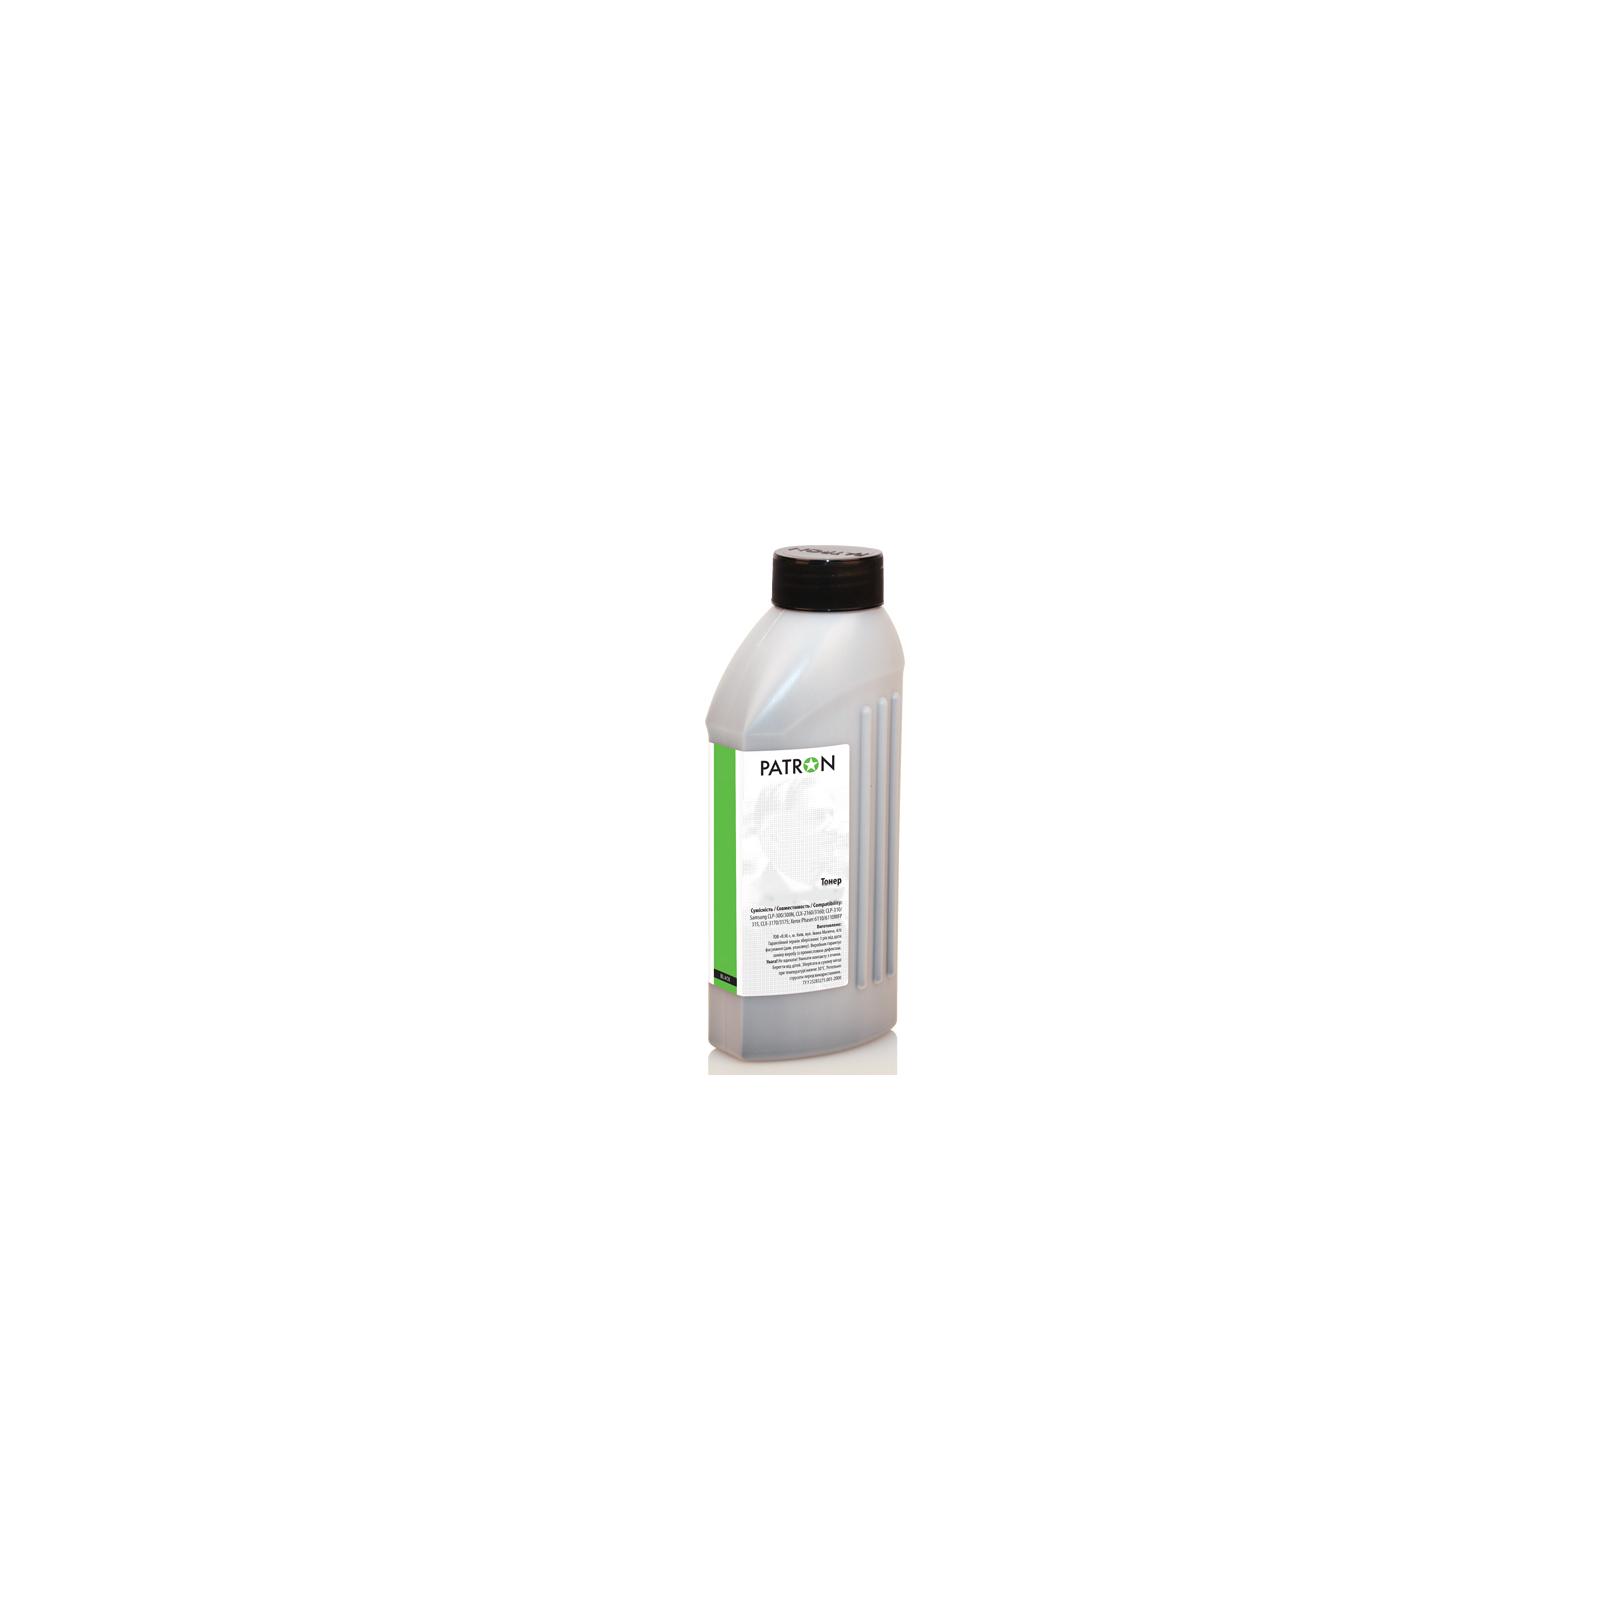 Тонер PATRON KYOCERA MITA TK-170 (FS-1320) 240г (T-PN-KFS1320-240)